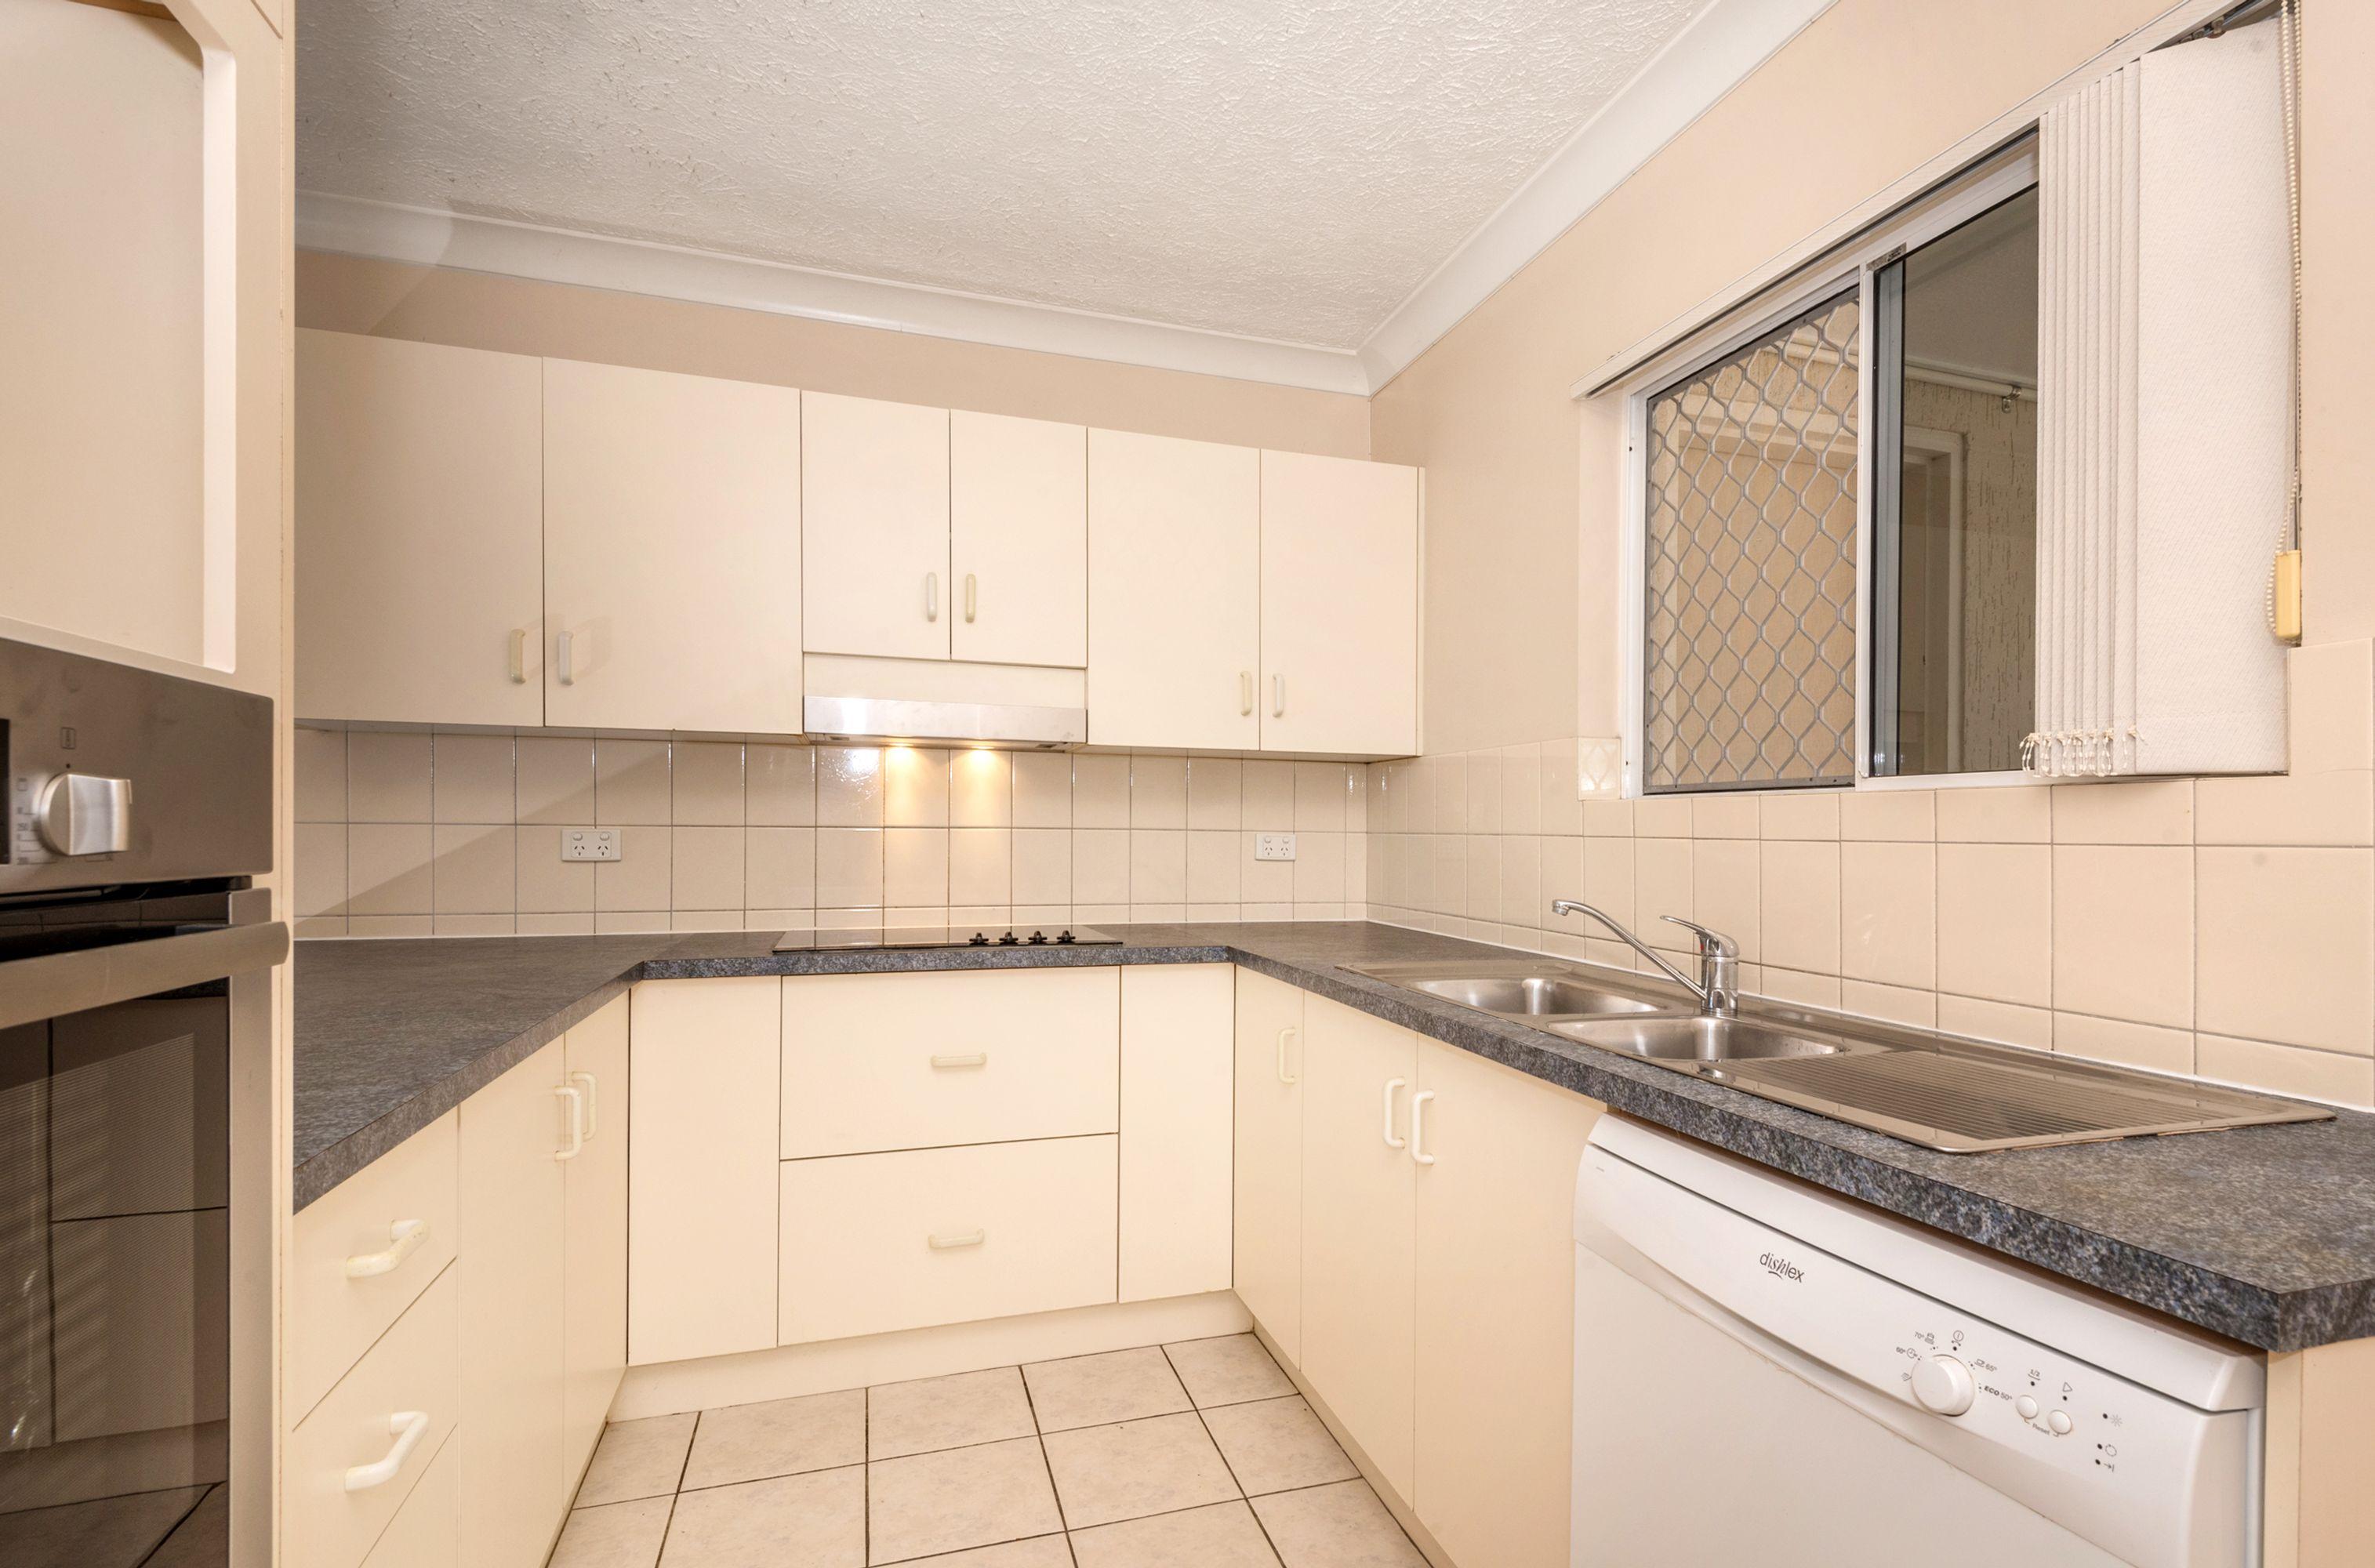 7/8 Gleeson Street, Hermit Park, QLD 4812